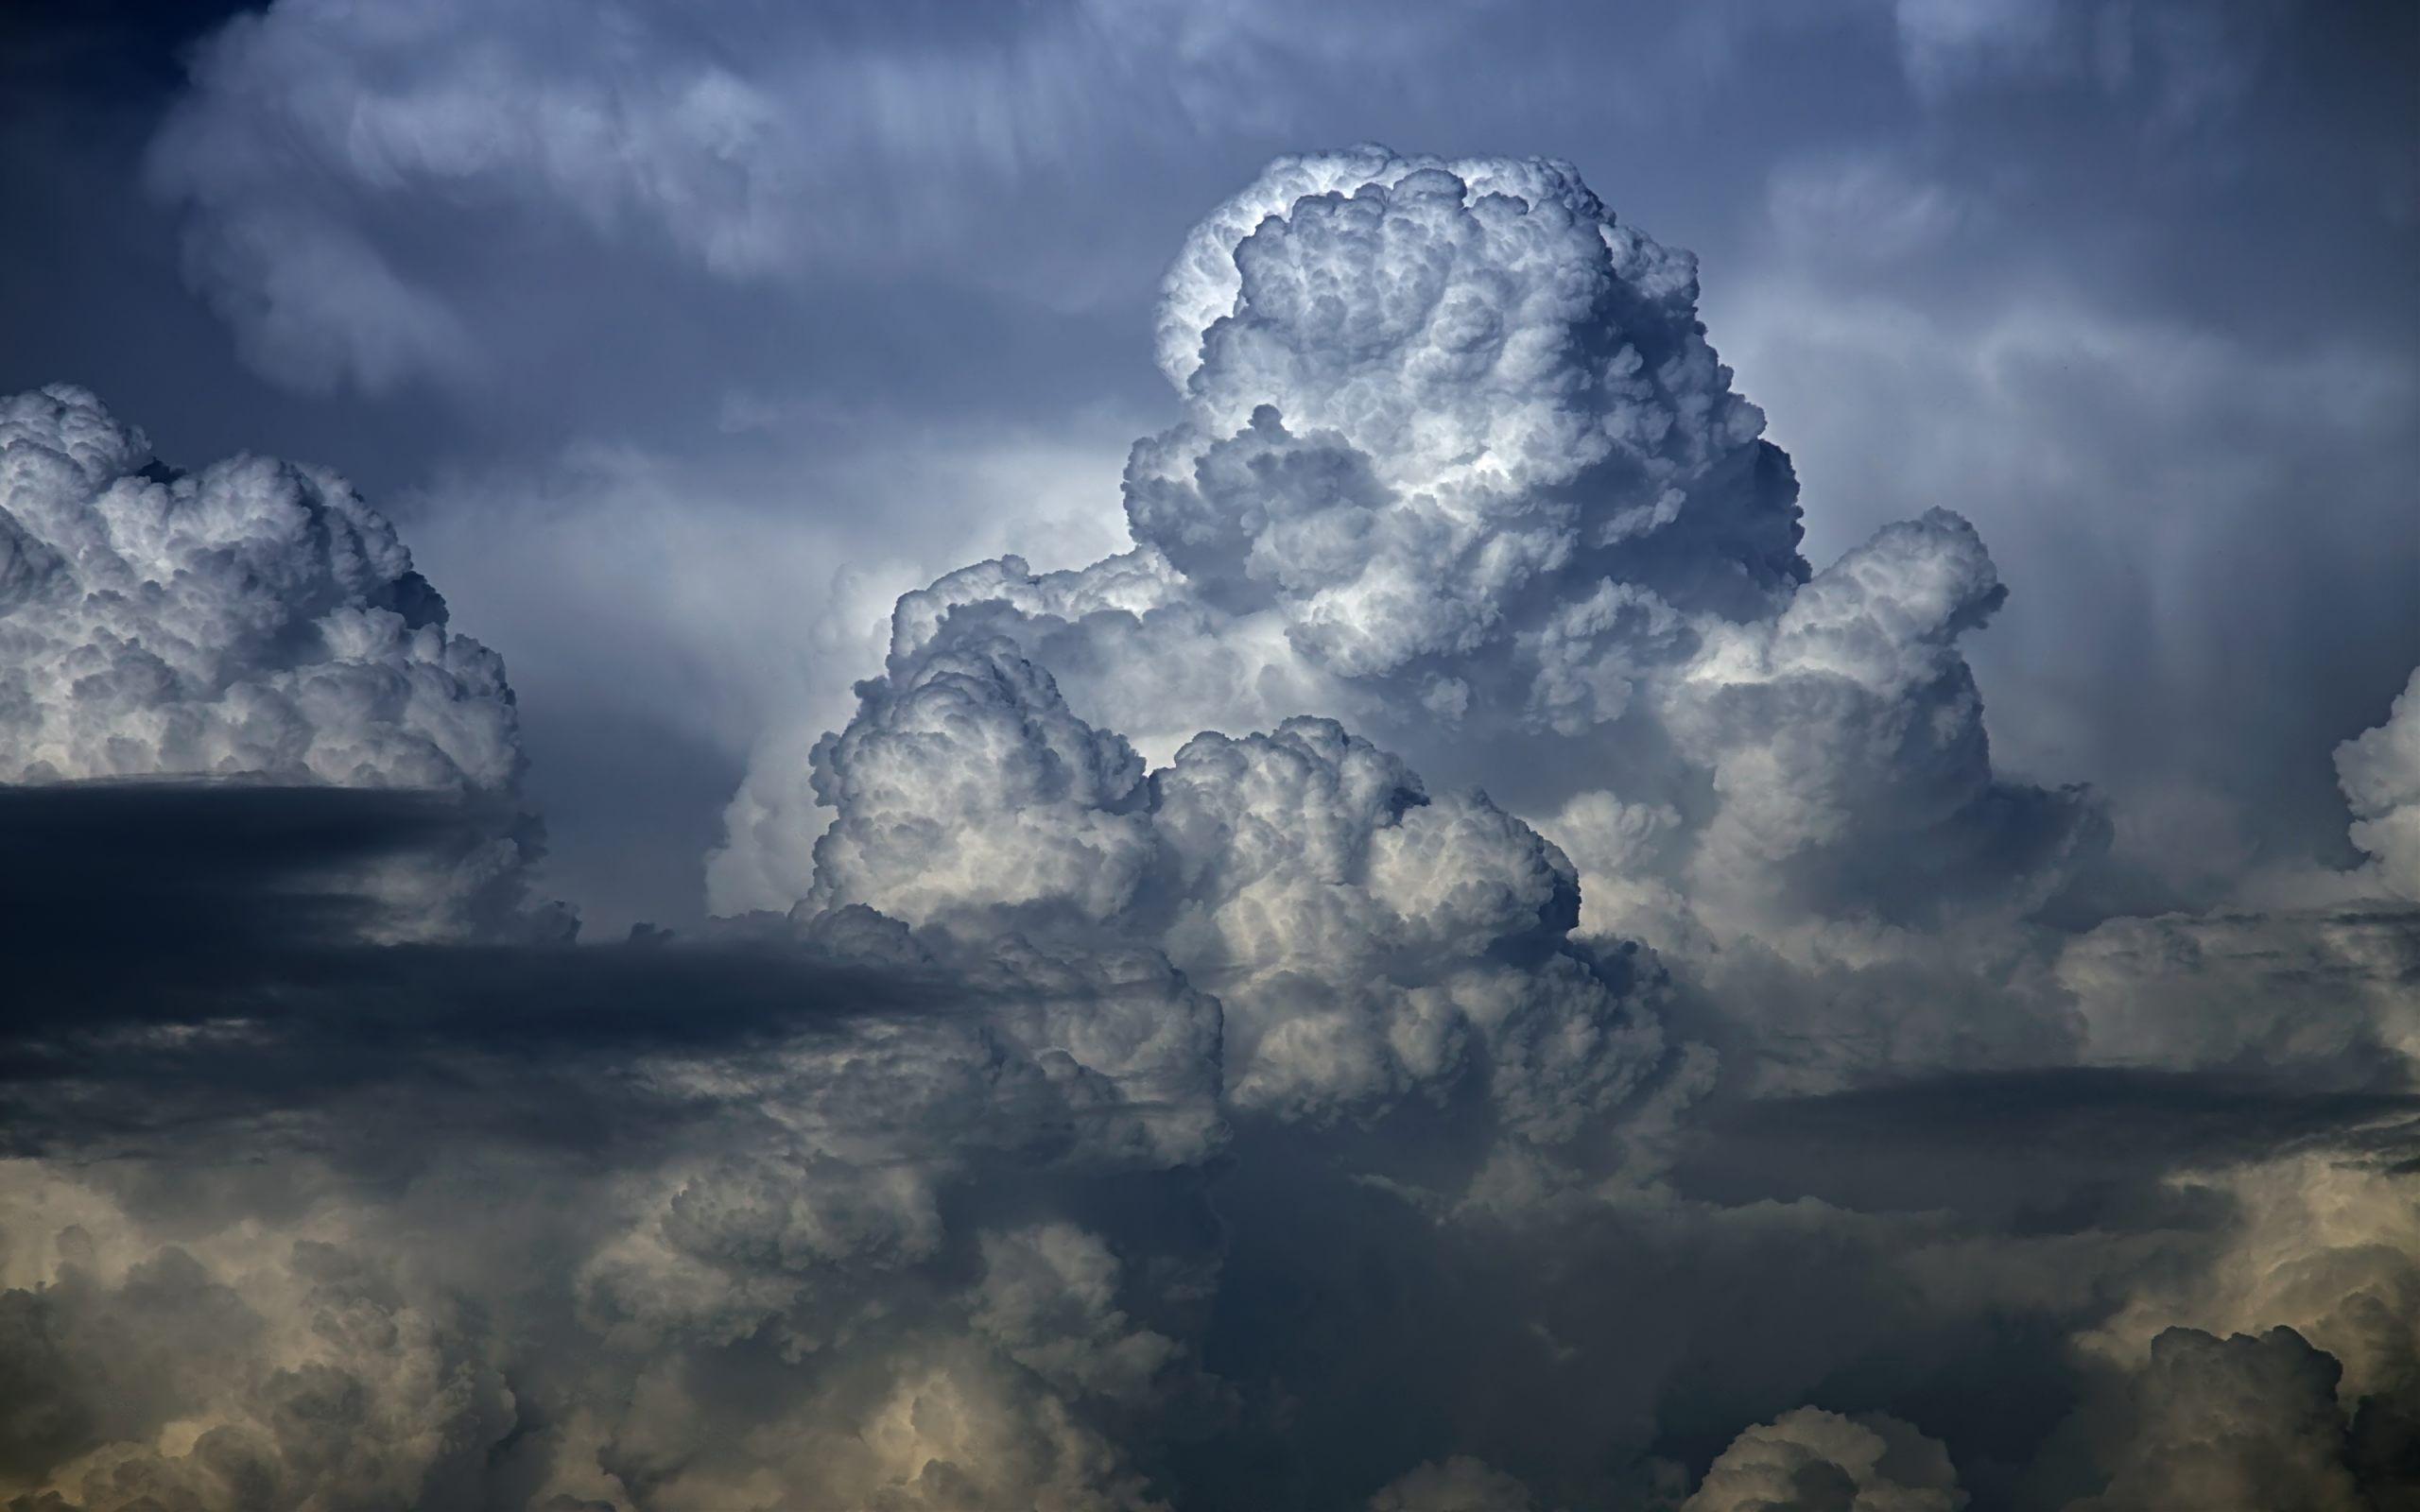 high resolution wallpapers = cloud wallpaper, 290 kb - thompson